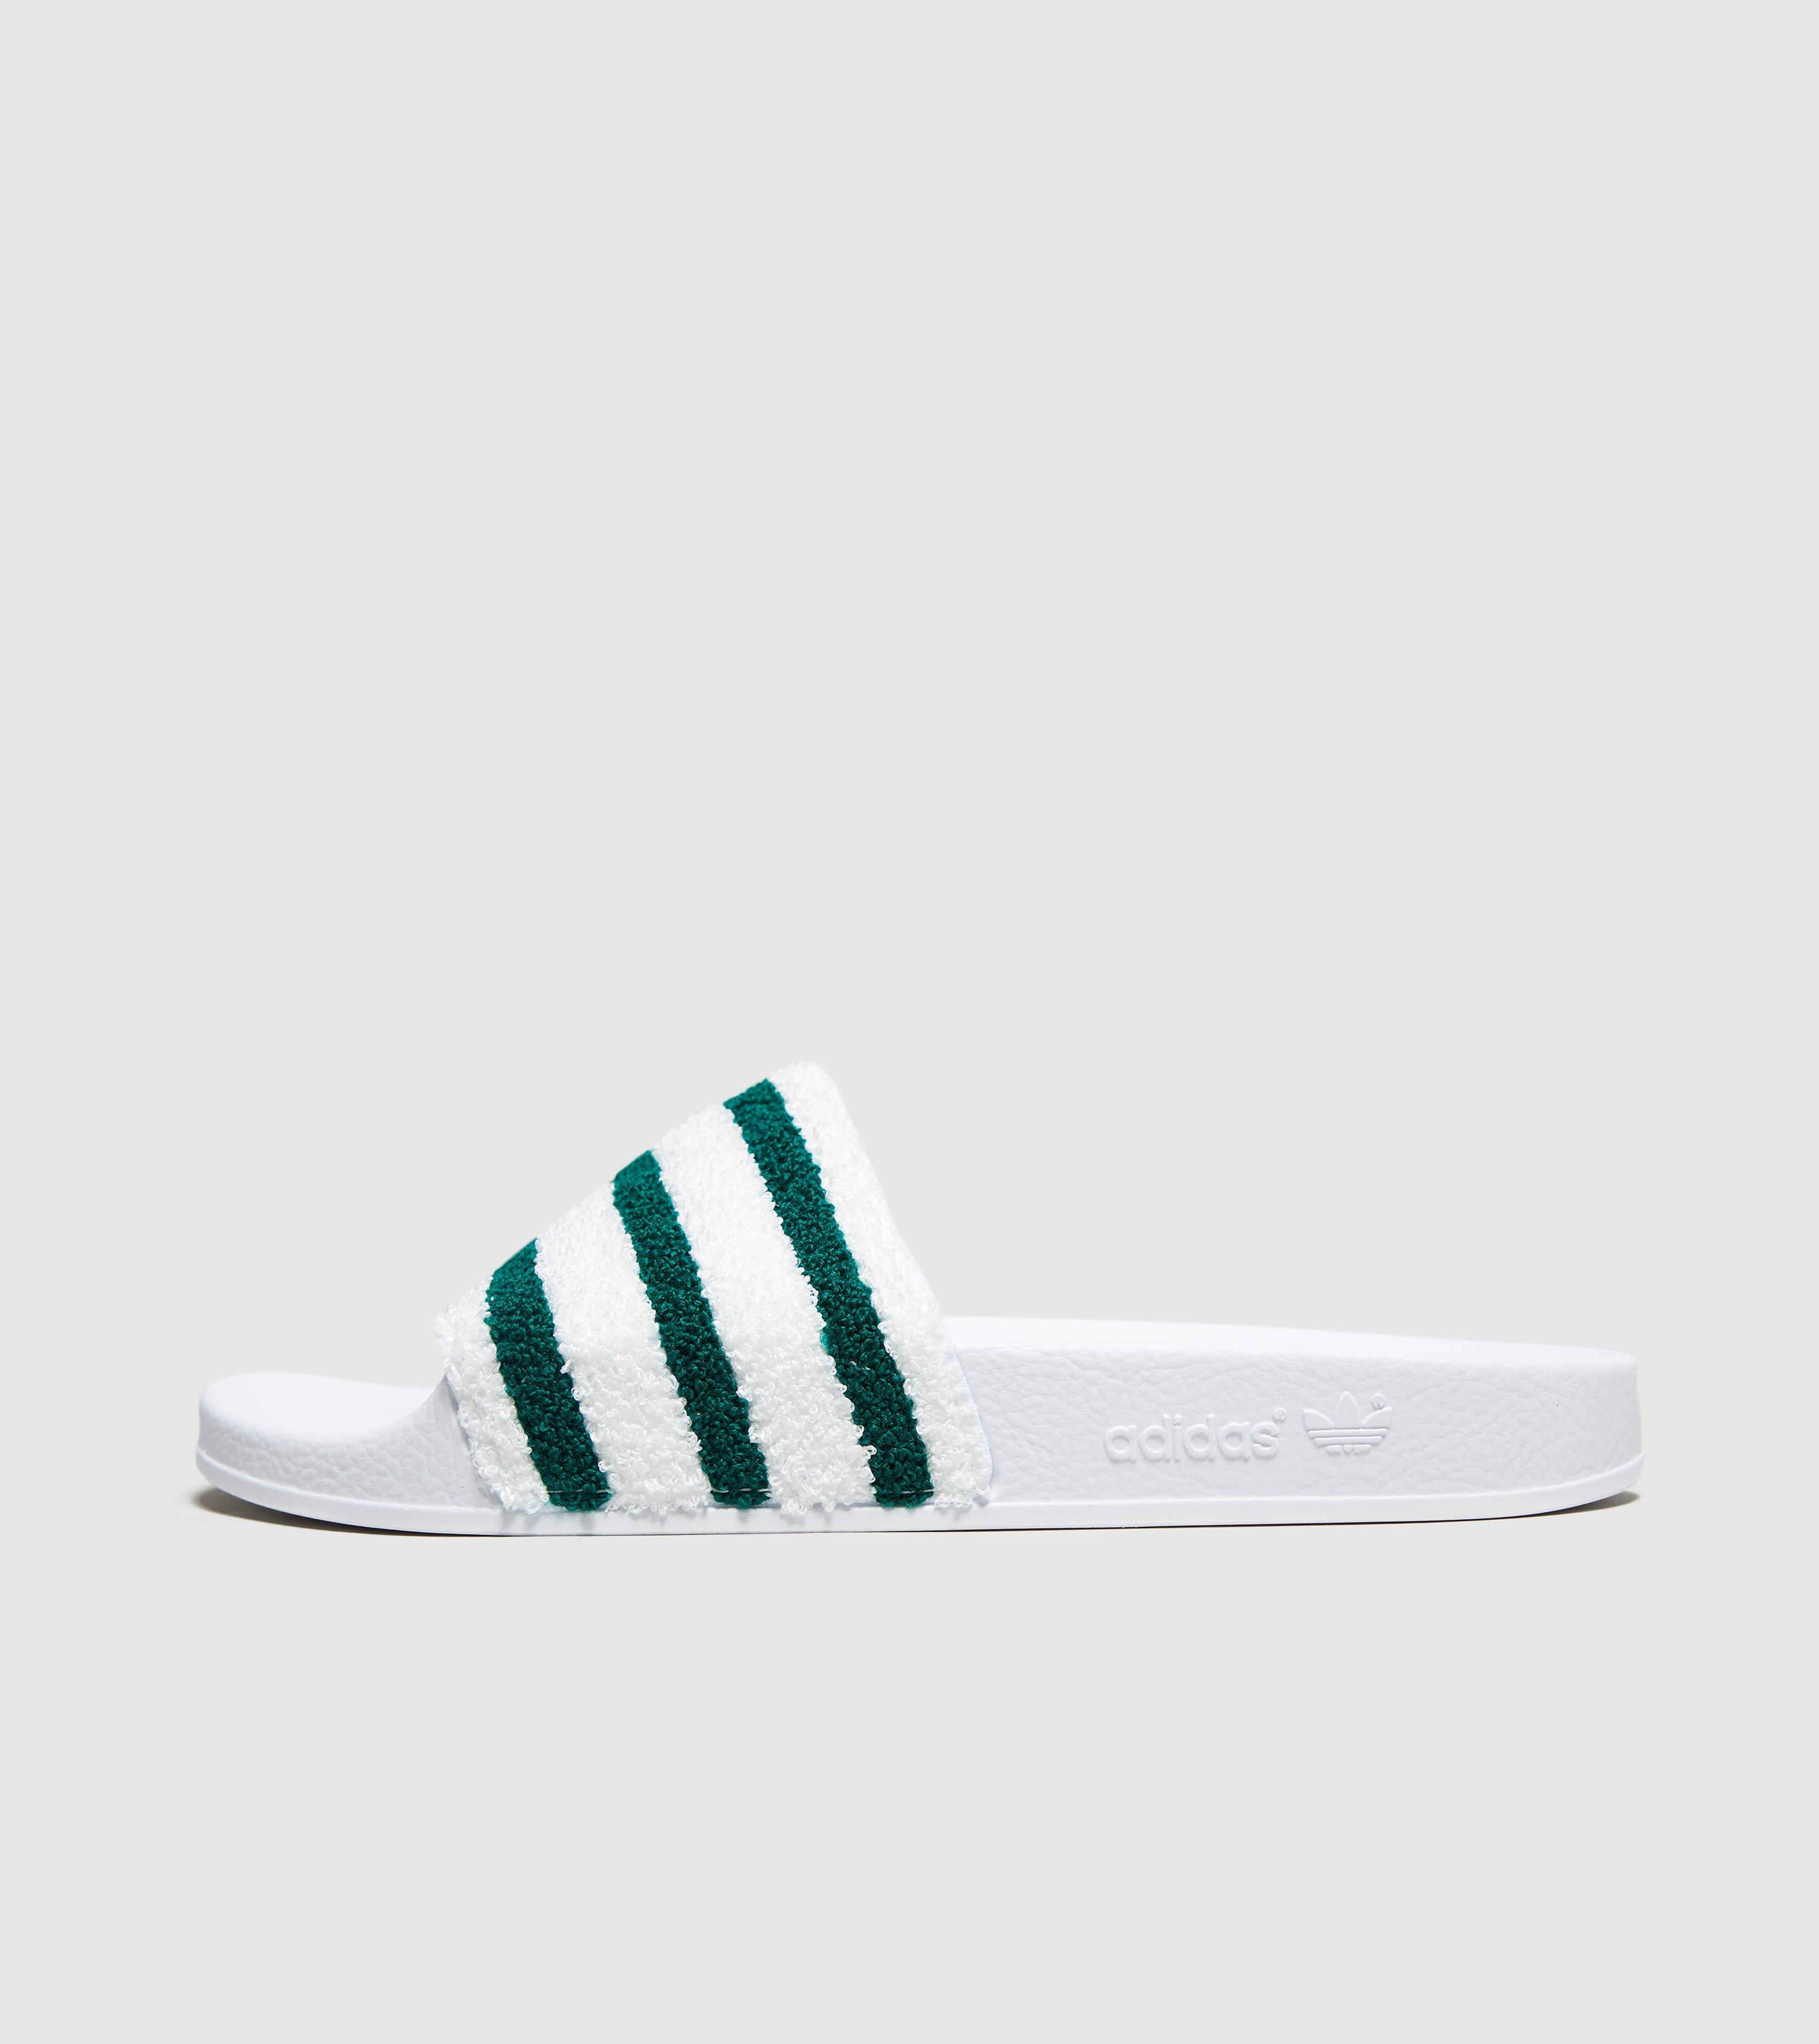 dc56aa29b84 Lyst - adidas Originals Adilette Towelling Slides in White